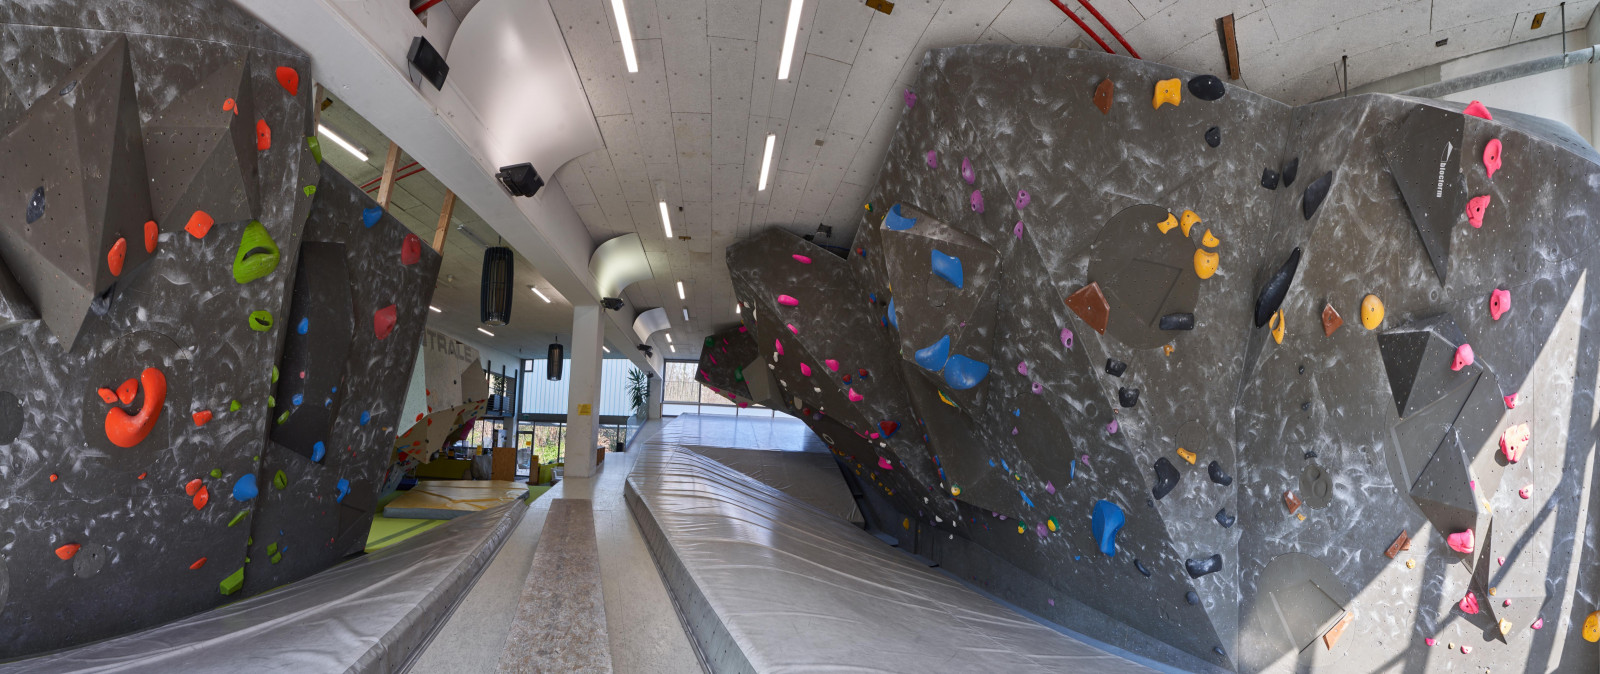 Impressionen | B2 Boulders & Bar